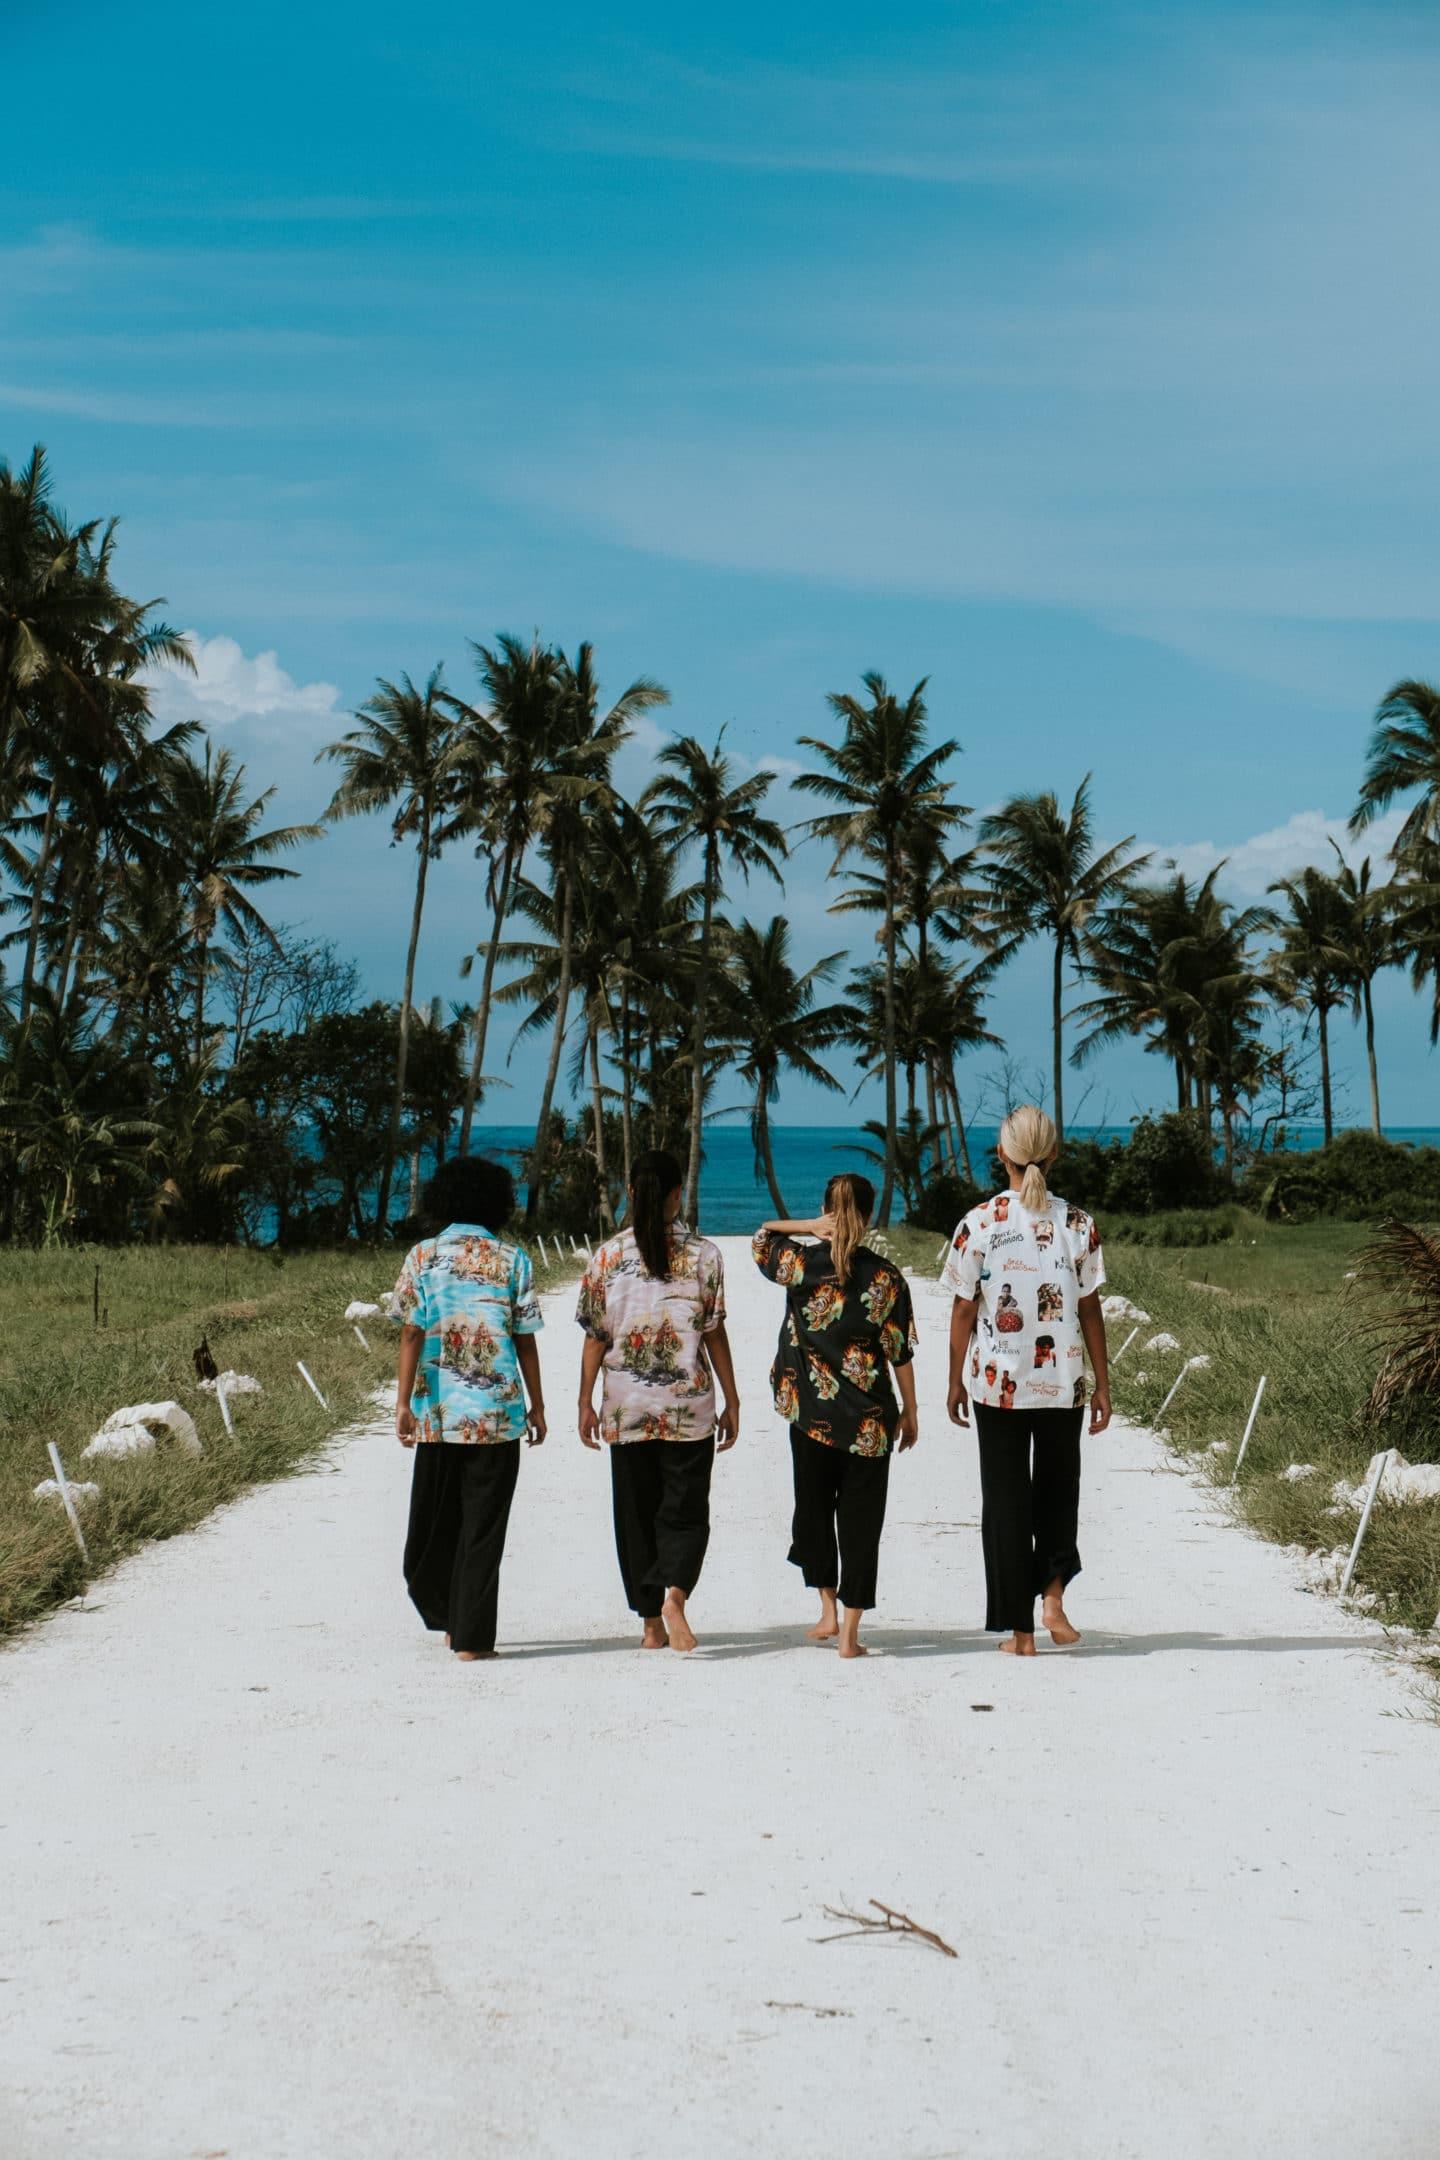 Potato Head Bali Spring/Summer 2019 collection Hawaiian shirt girls palm trees